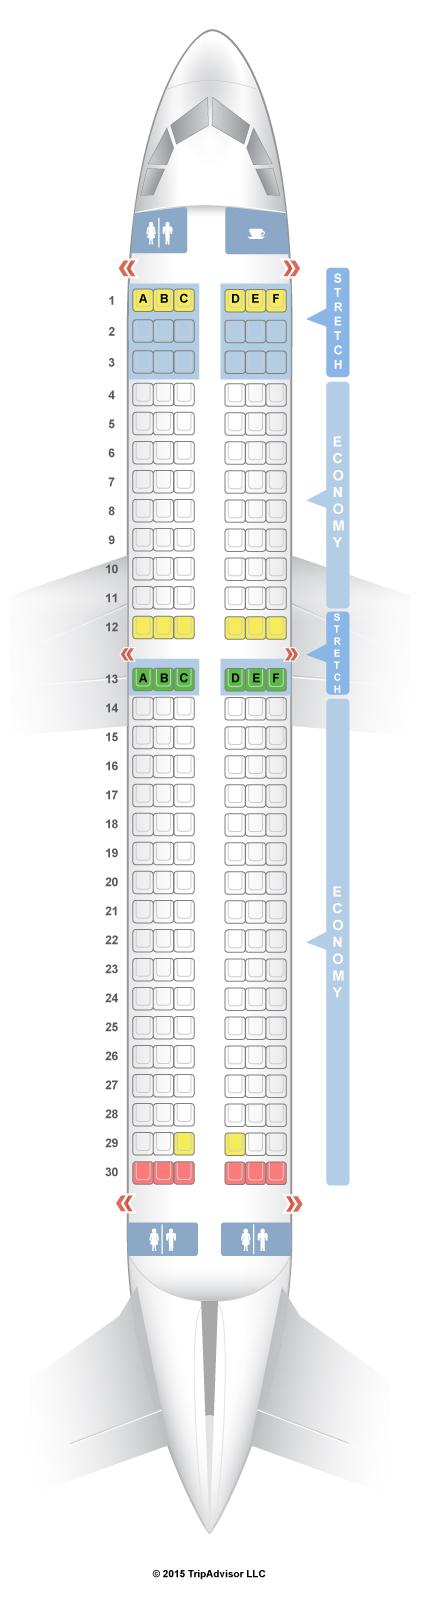 SeatGuru Seat Map Frontier Airbus A320 (320) V1